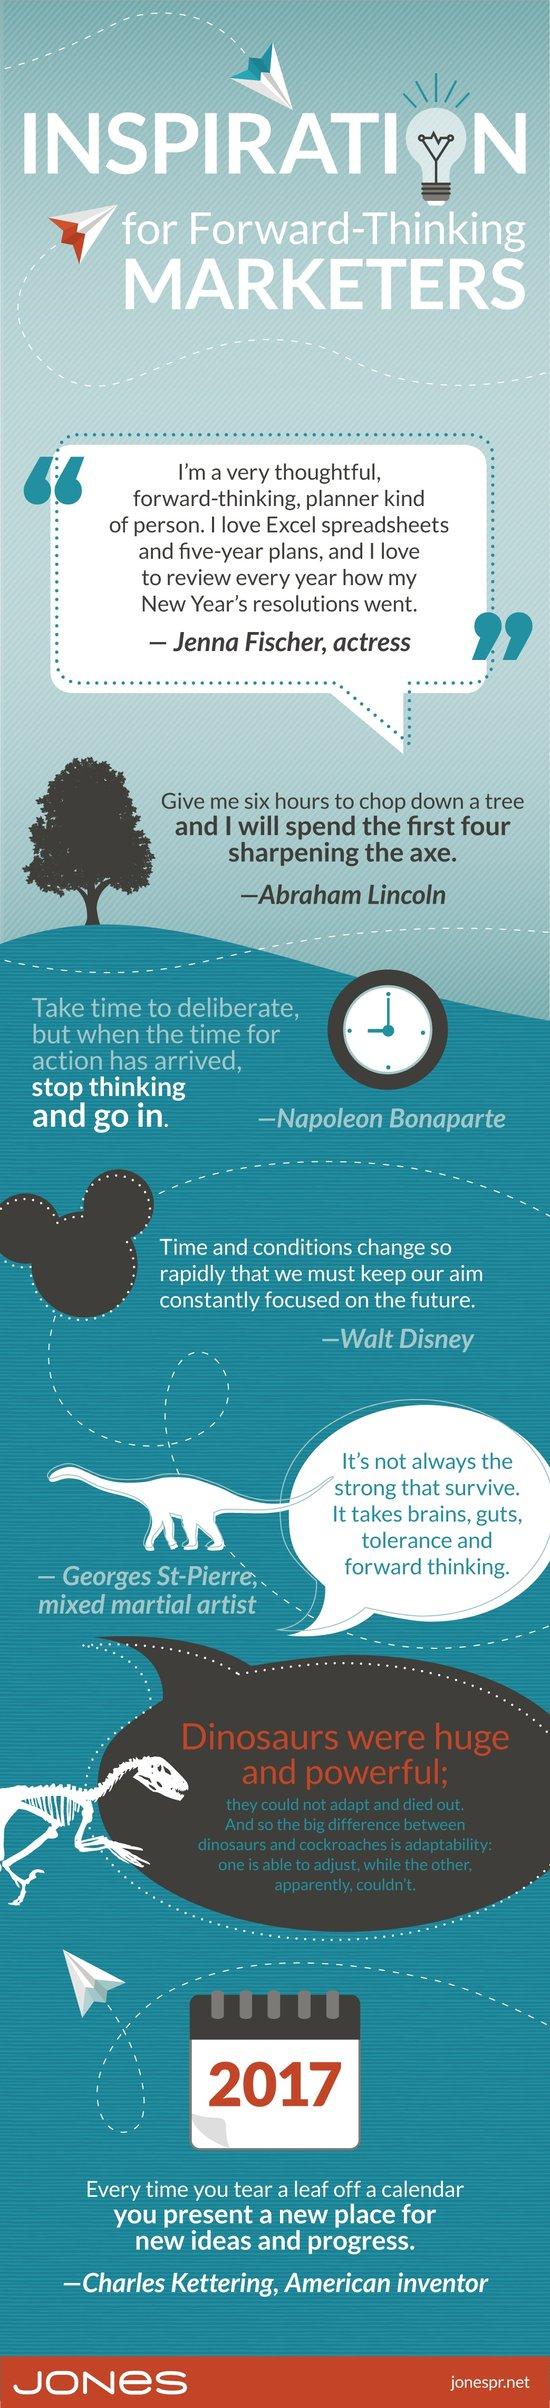 JONES-infographic-forward-thinking-inspiration.jpg